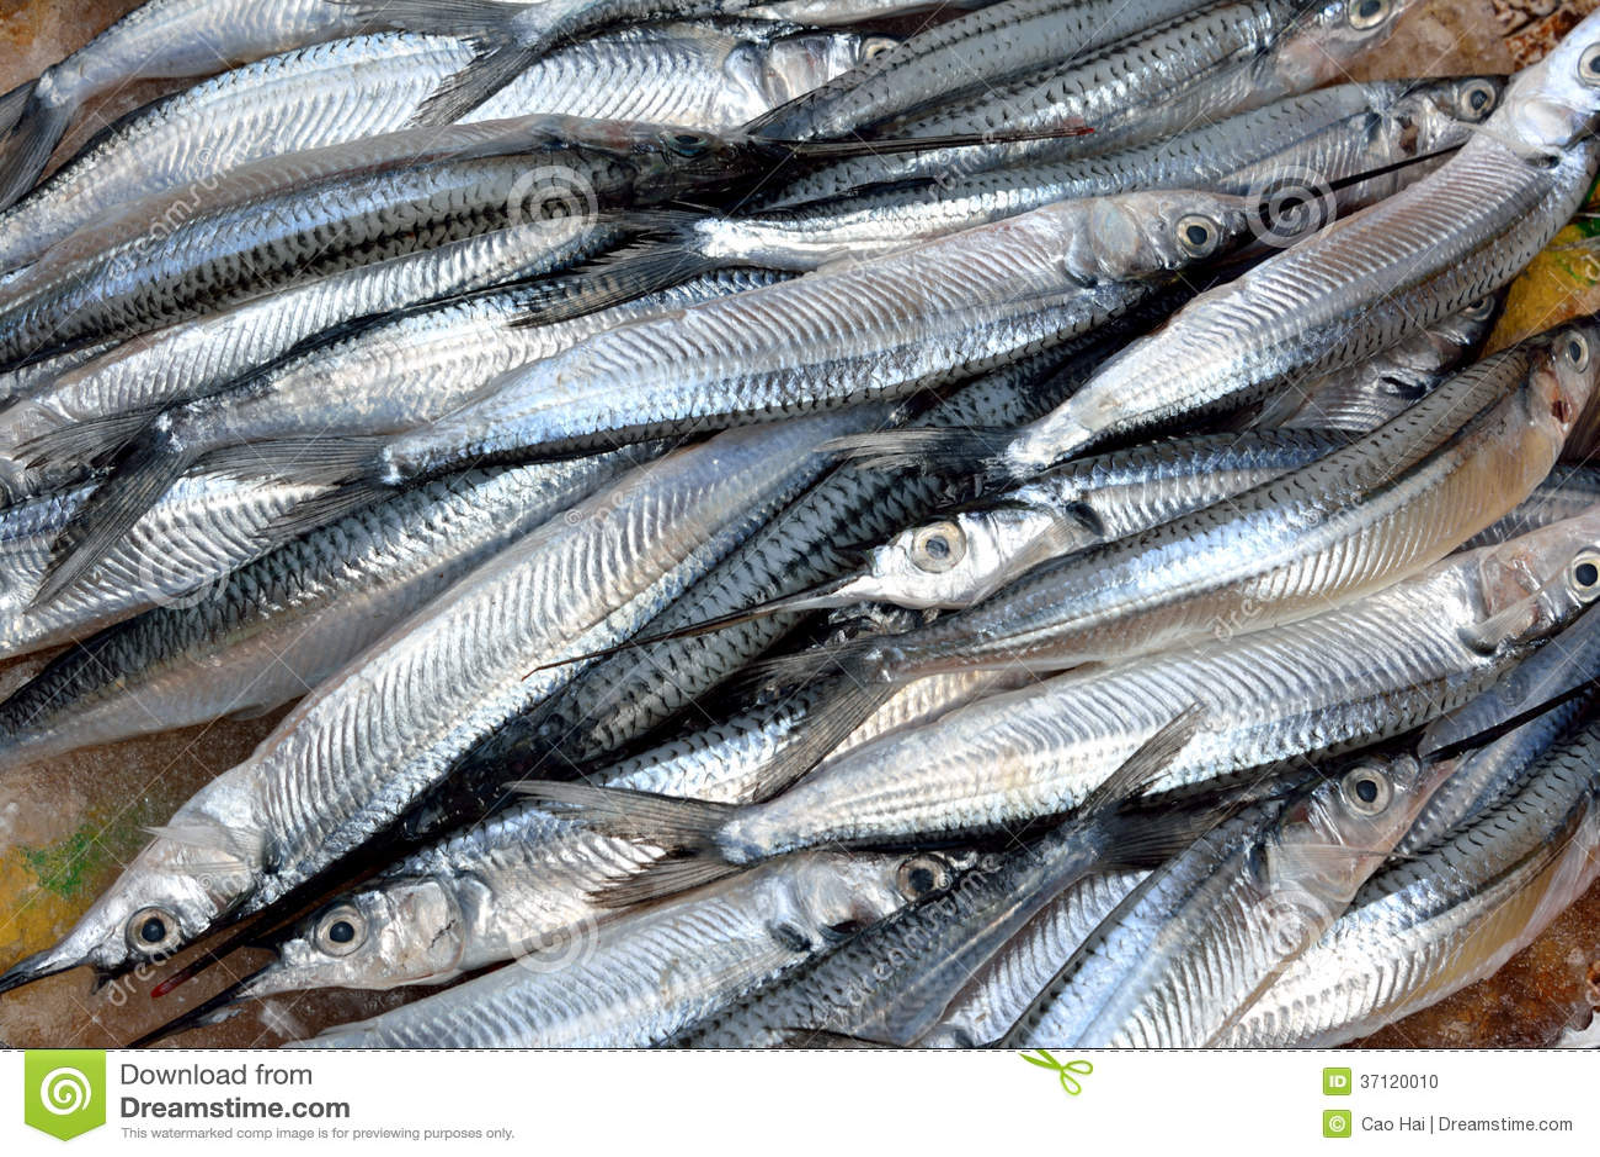 Sliver fish